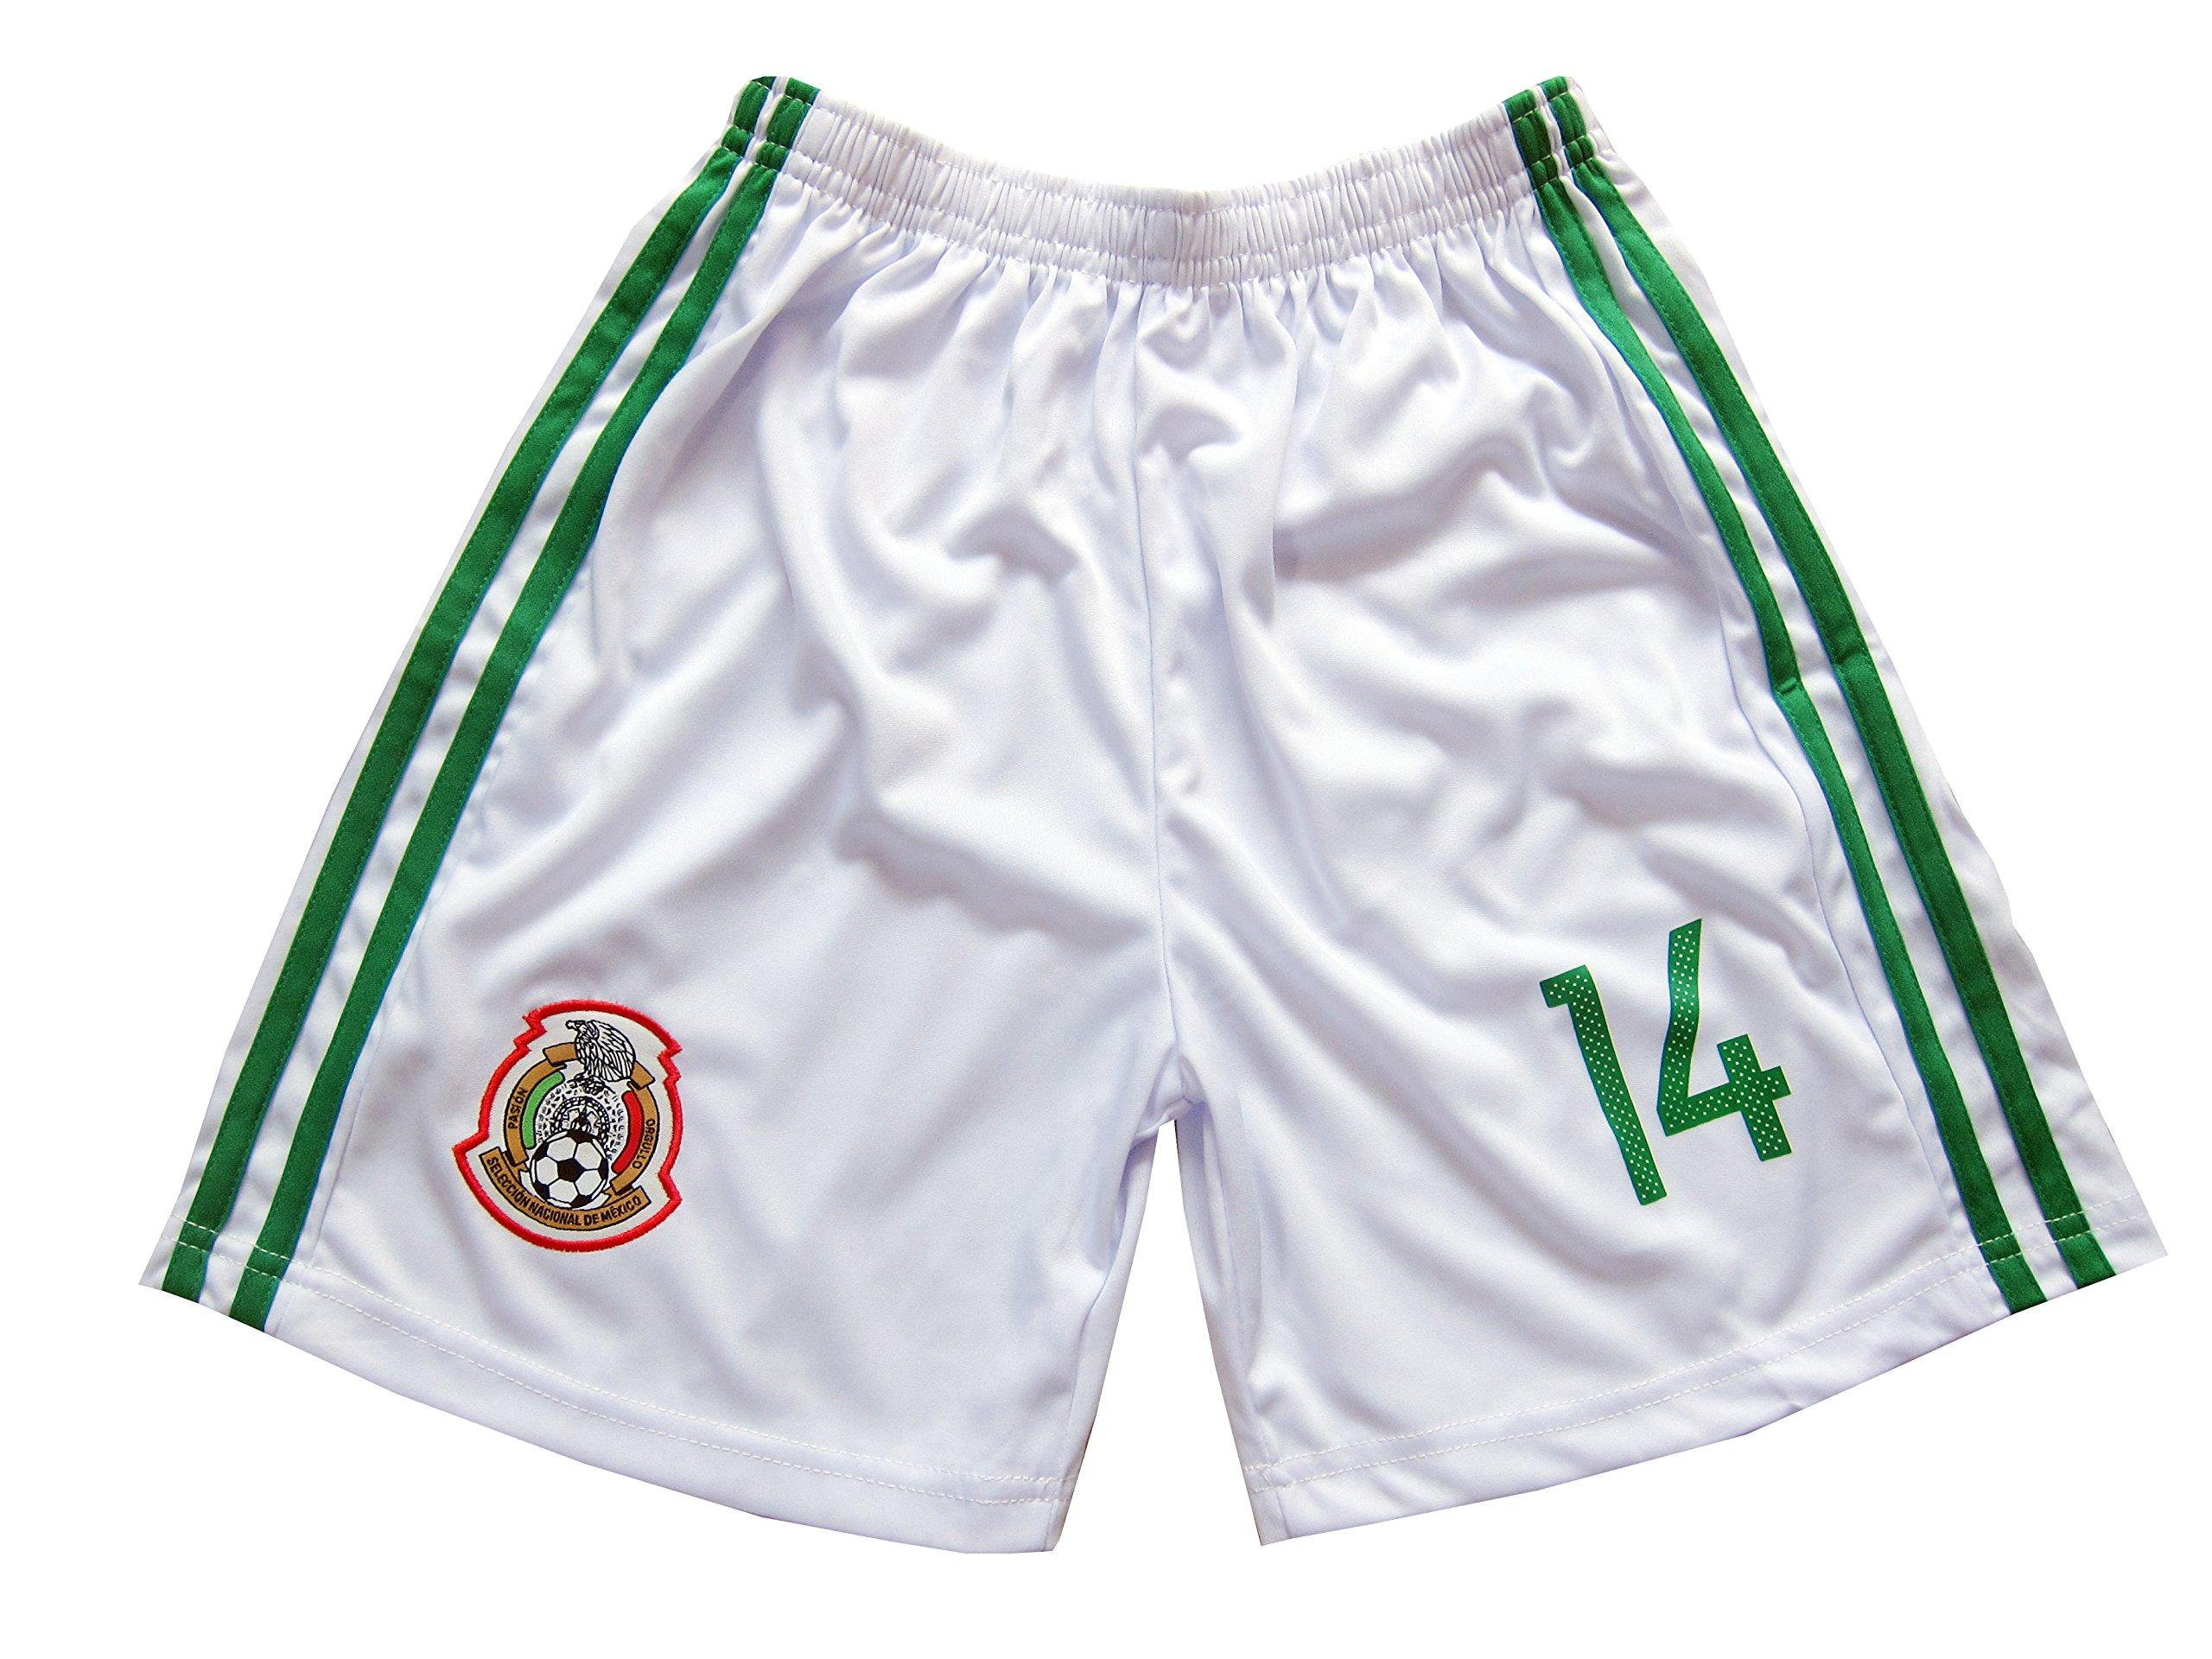 a2e41cbbda1 KID BOX 2018 FWC Mexico  14 CHICHARITO Kids Home Soccer Jersey   Shorts  Socks Set Youth Sizes (Home